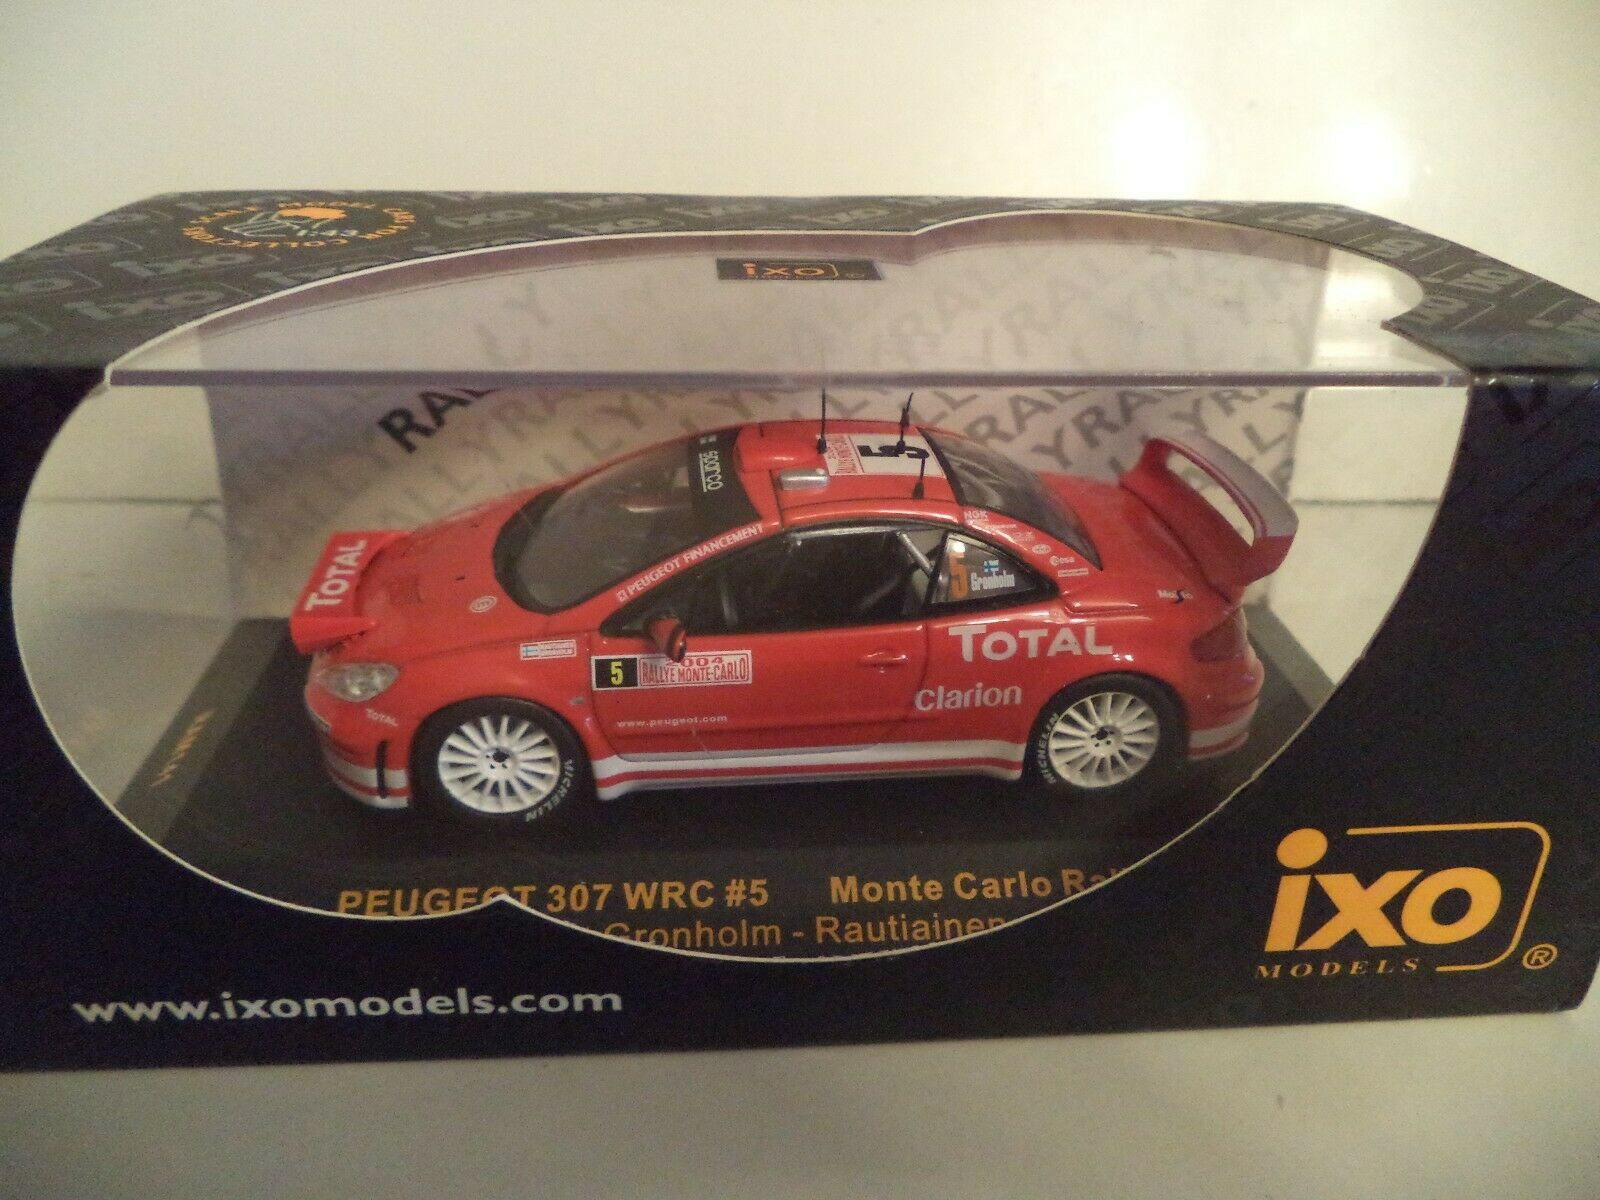 1:43 RAM 141 peugeot 307 wrc grönholm Rally de Monte 2004